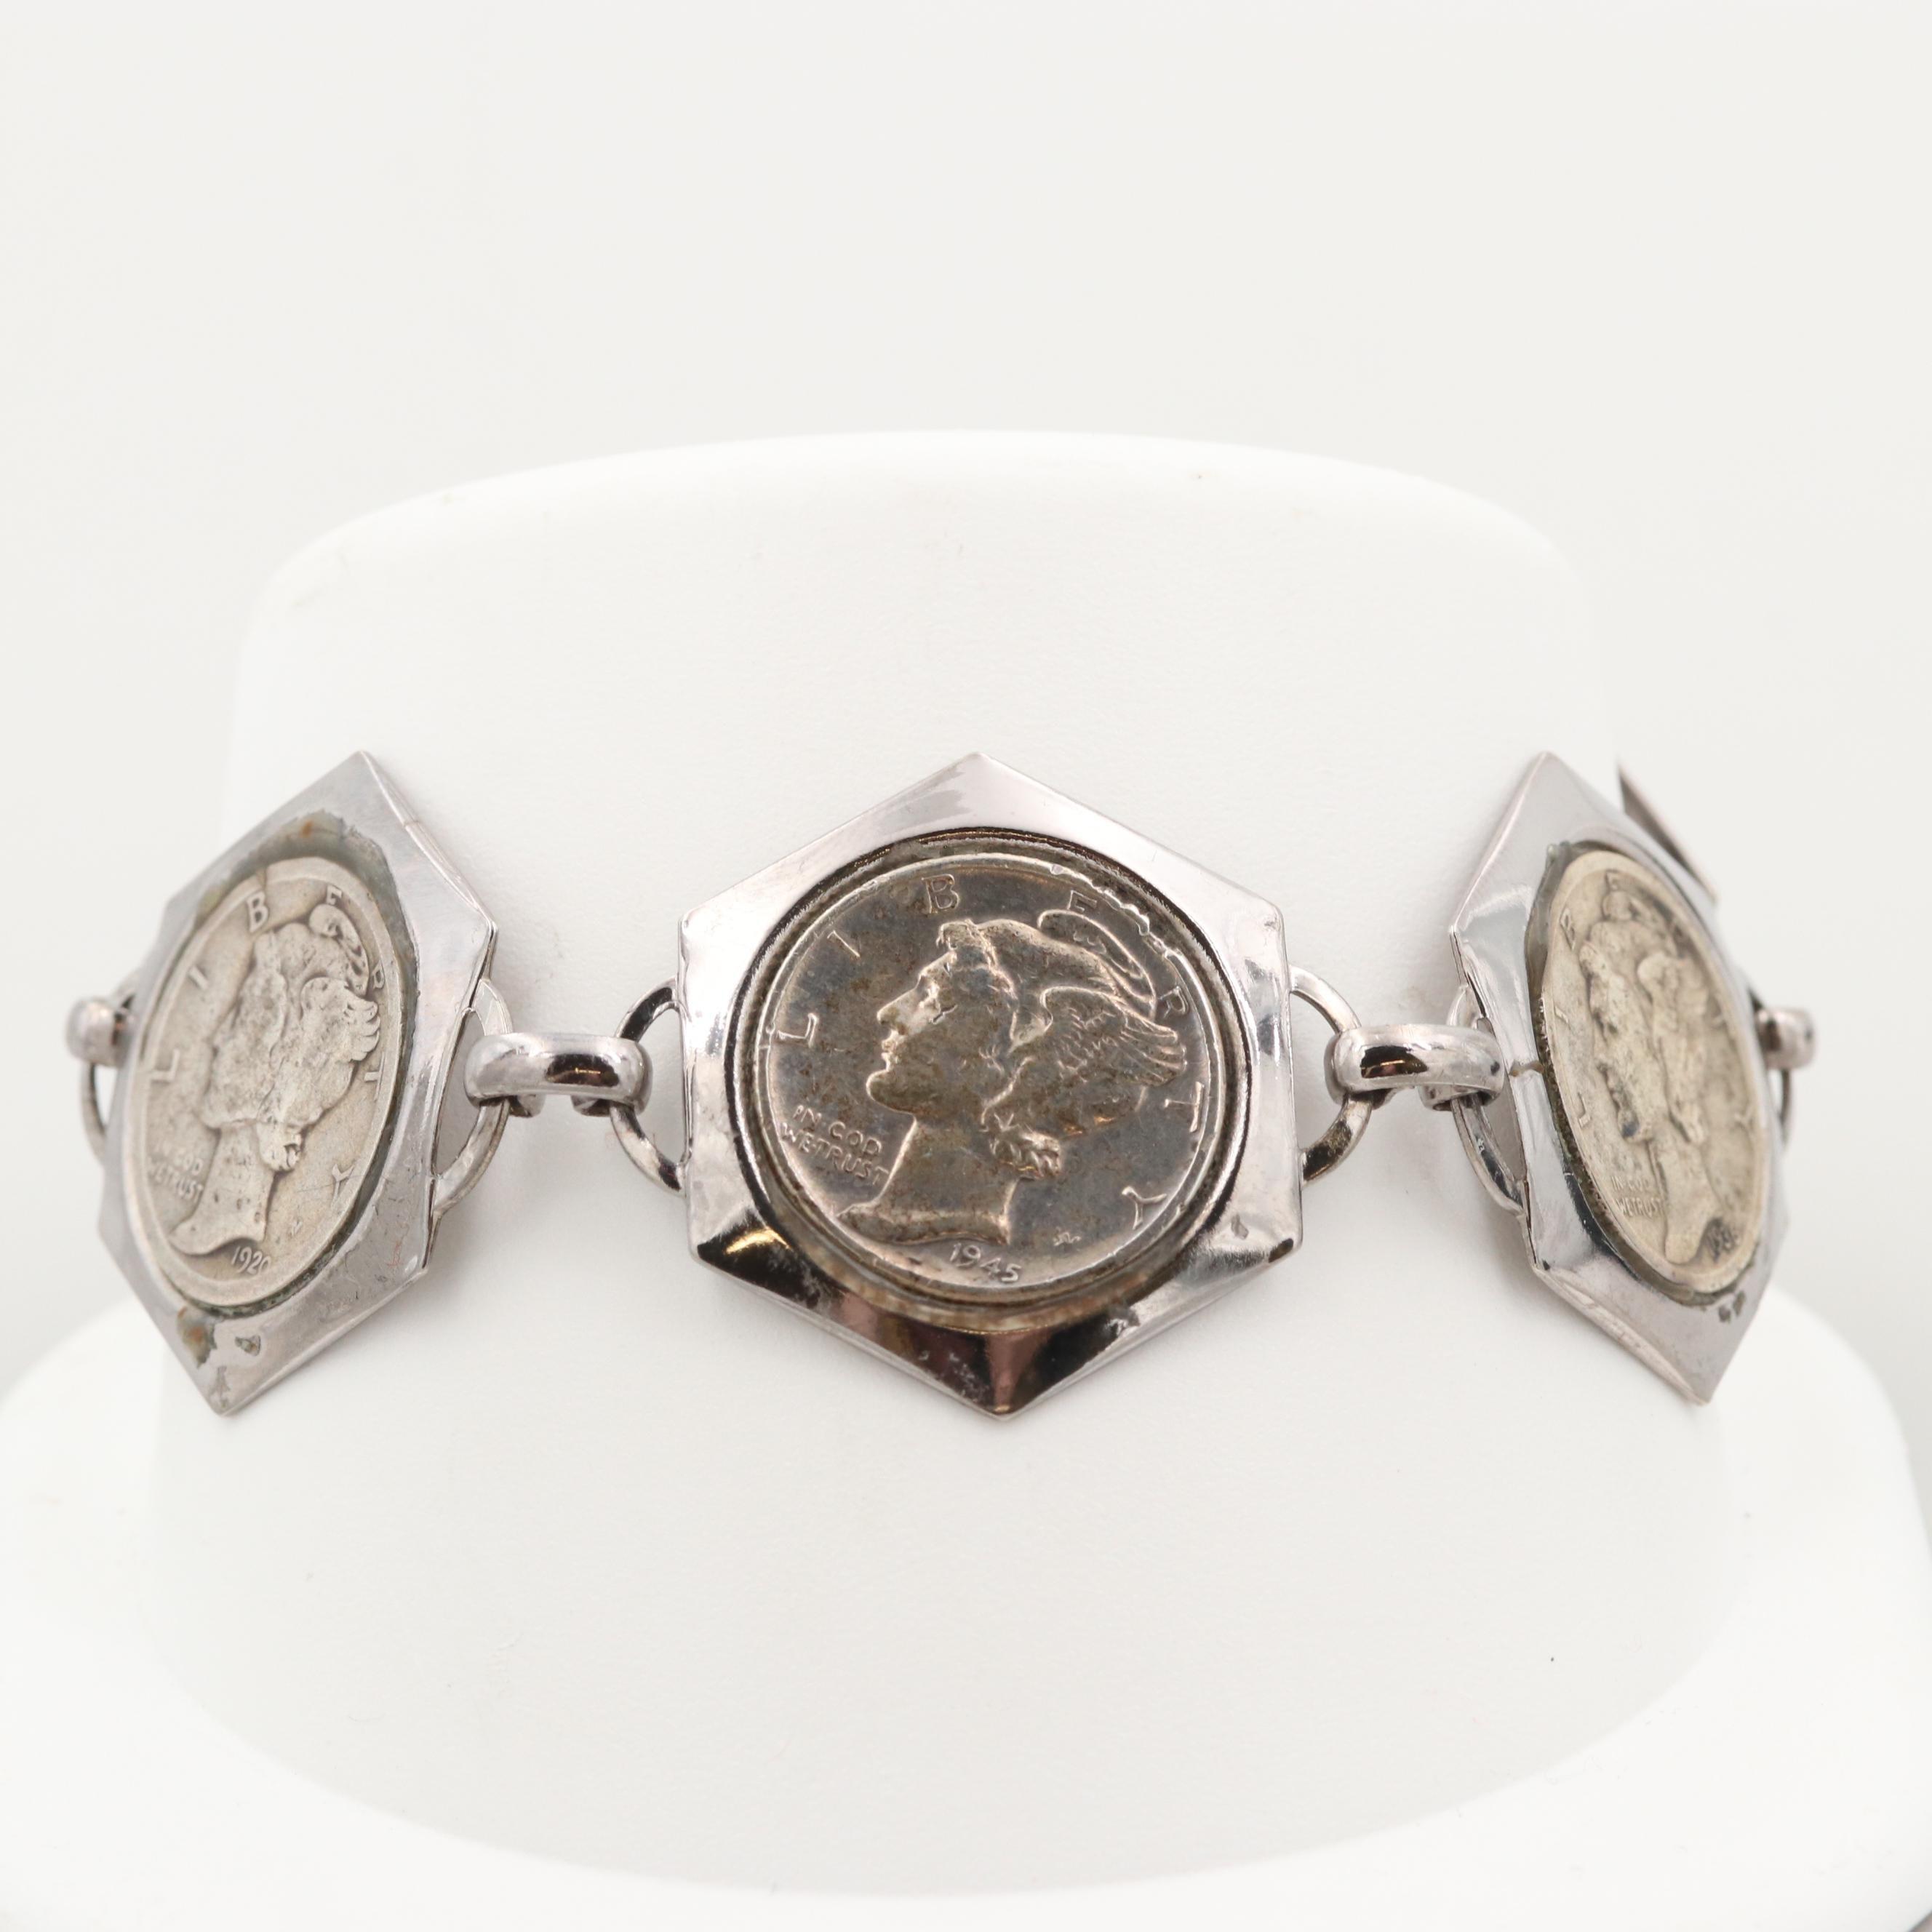 Silver Tone Link Bracelet with Mercury Silver Dimes